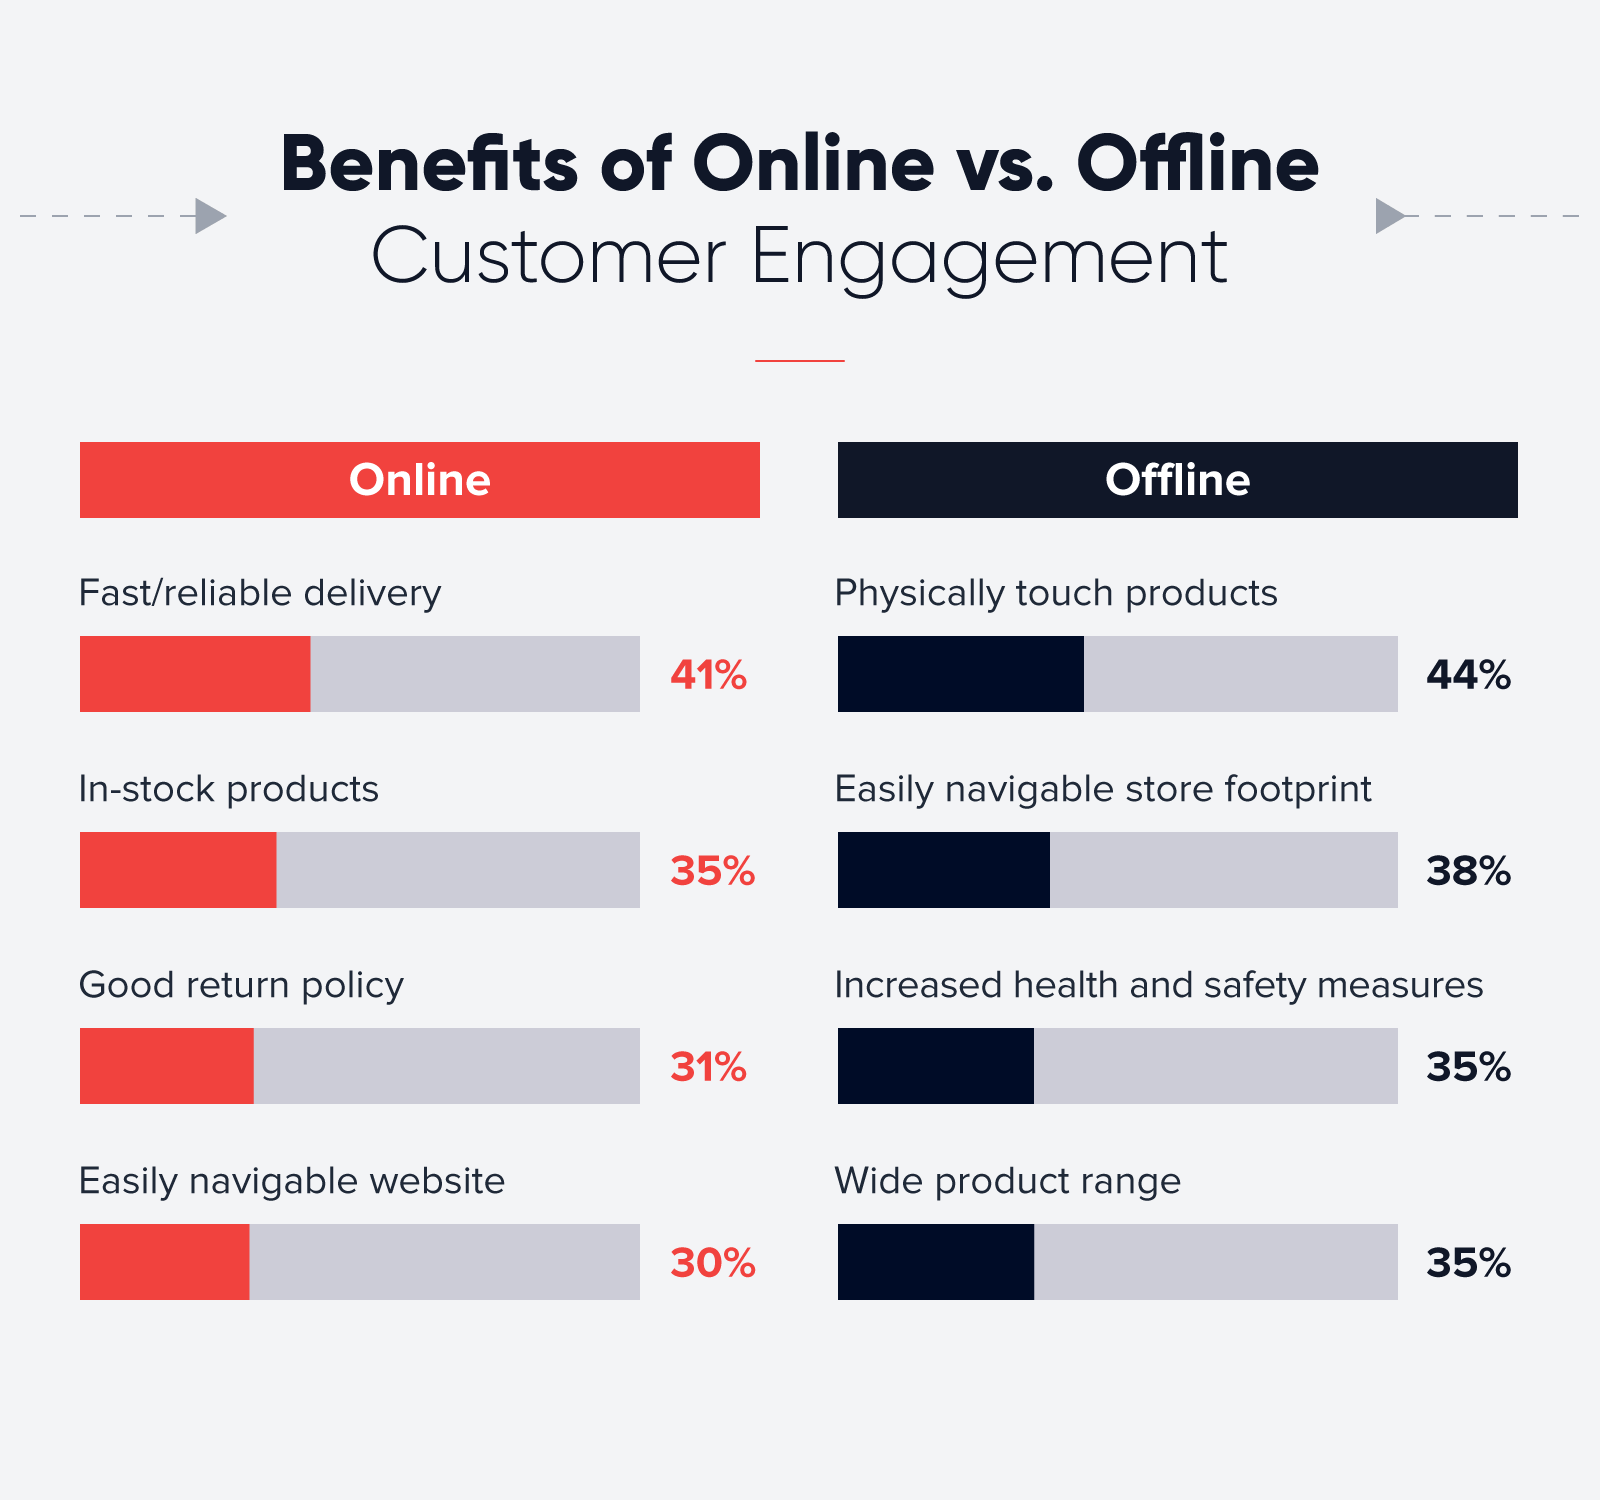 benefits of online vs offline customer engagement table